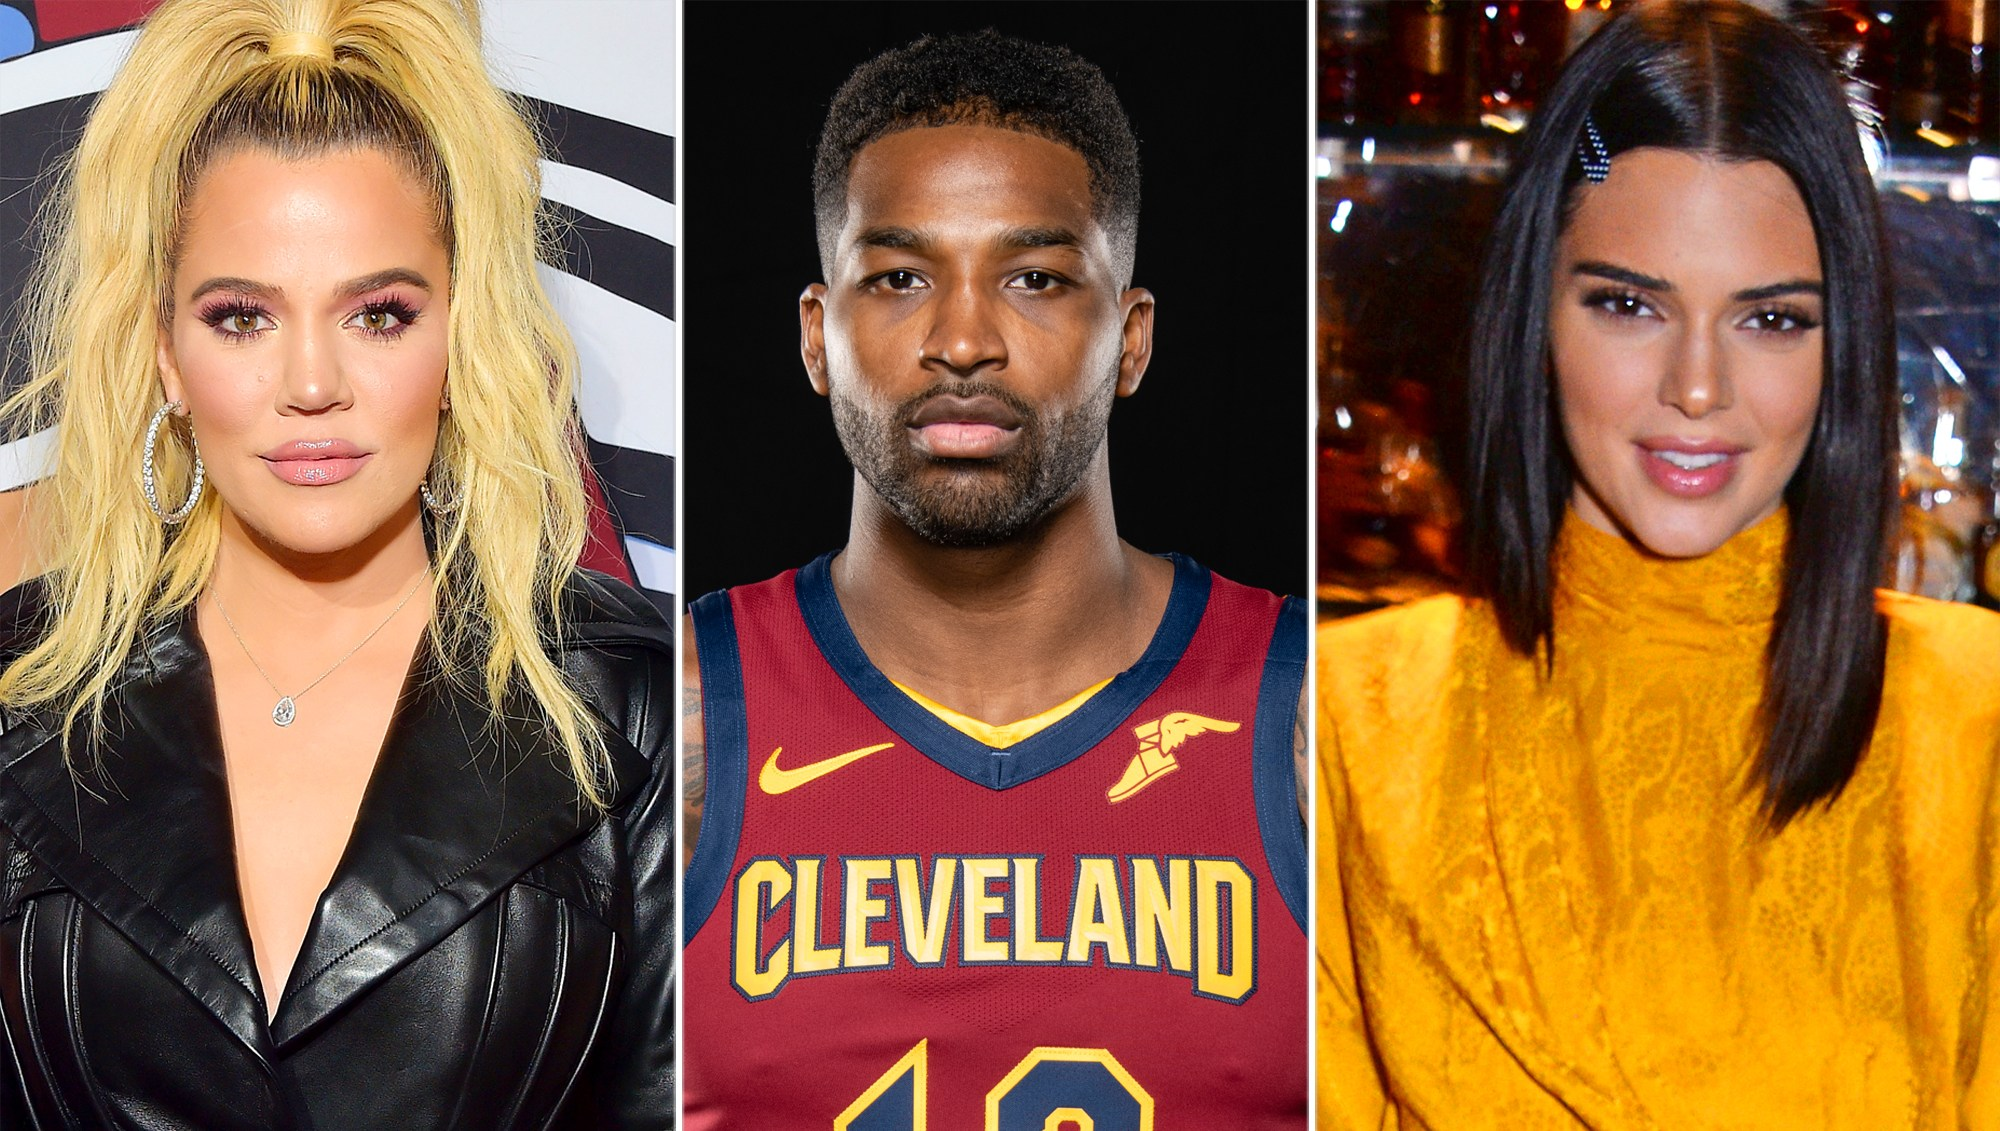 Khloe Kardashian, Tristan Thompson, Kendall Jenner